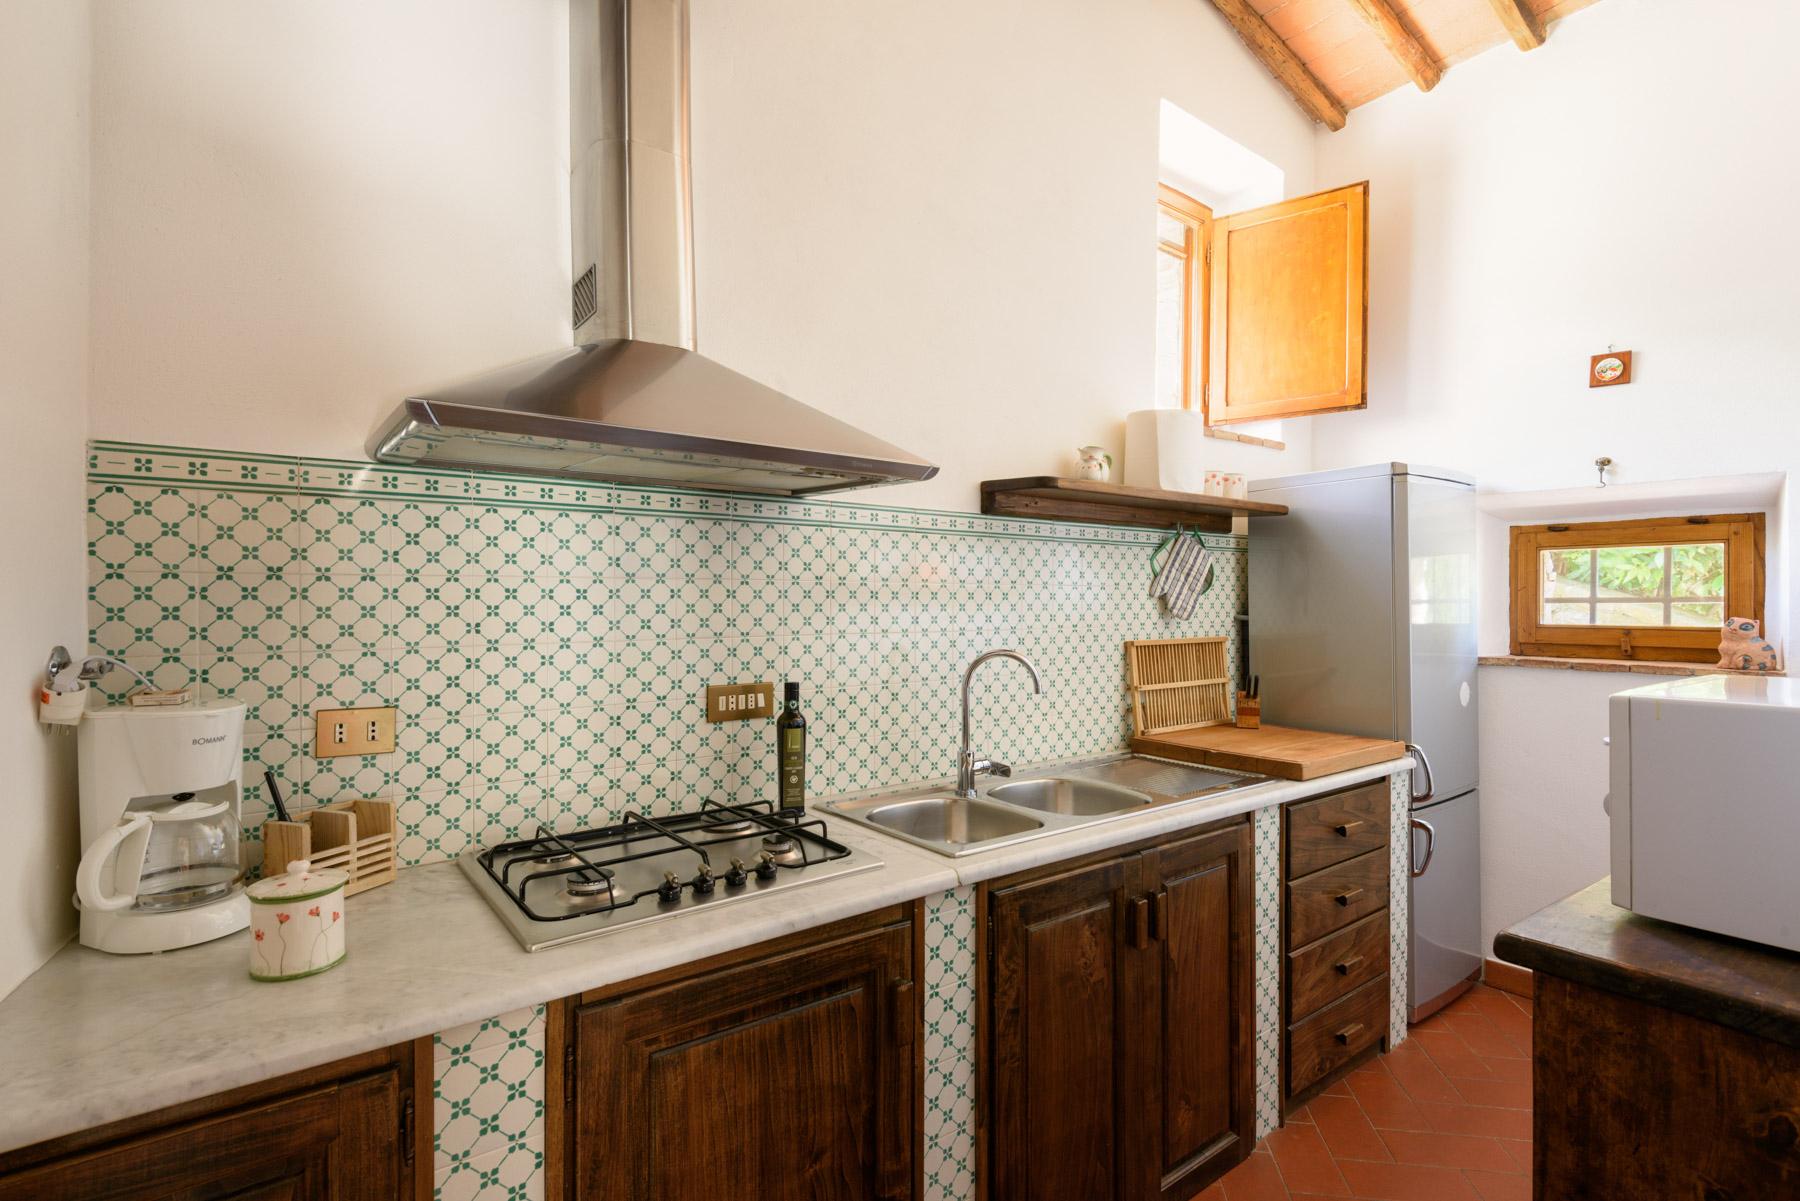 Rustico in Vendita a Castellina In Chianti: 5 locali, 650 mq - Foto 14